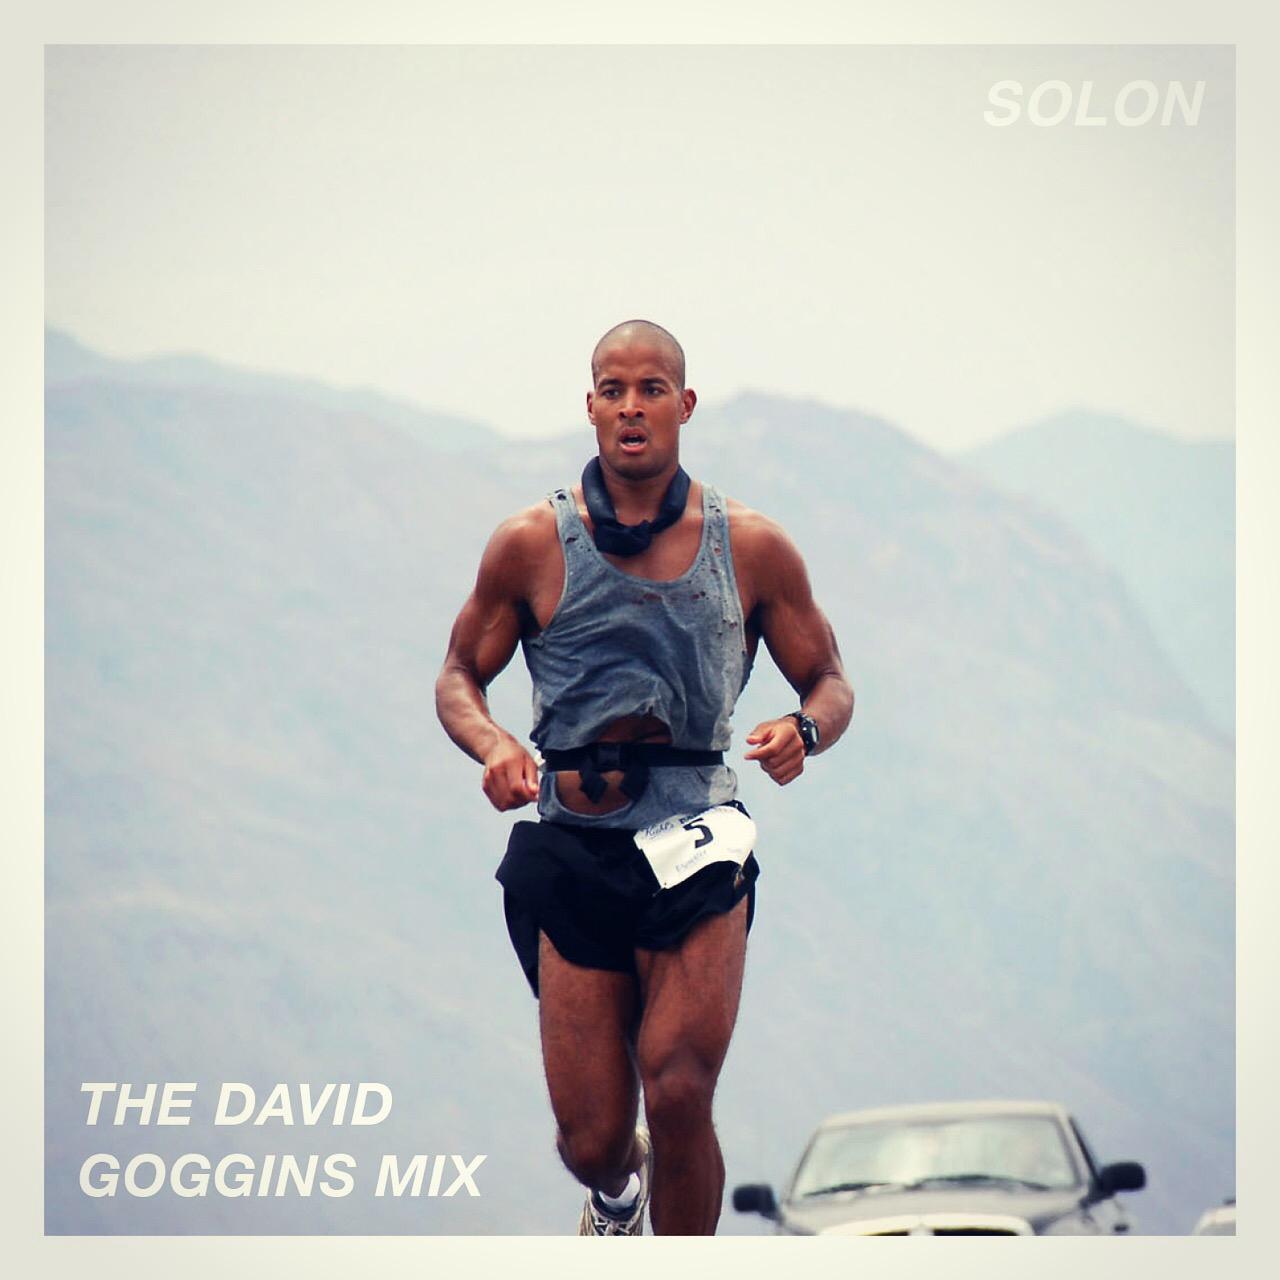 The David Goggins Mix - Album Art